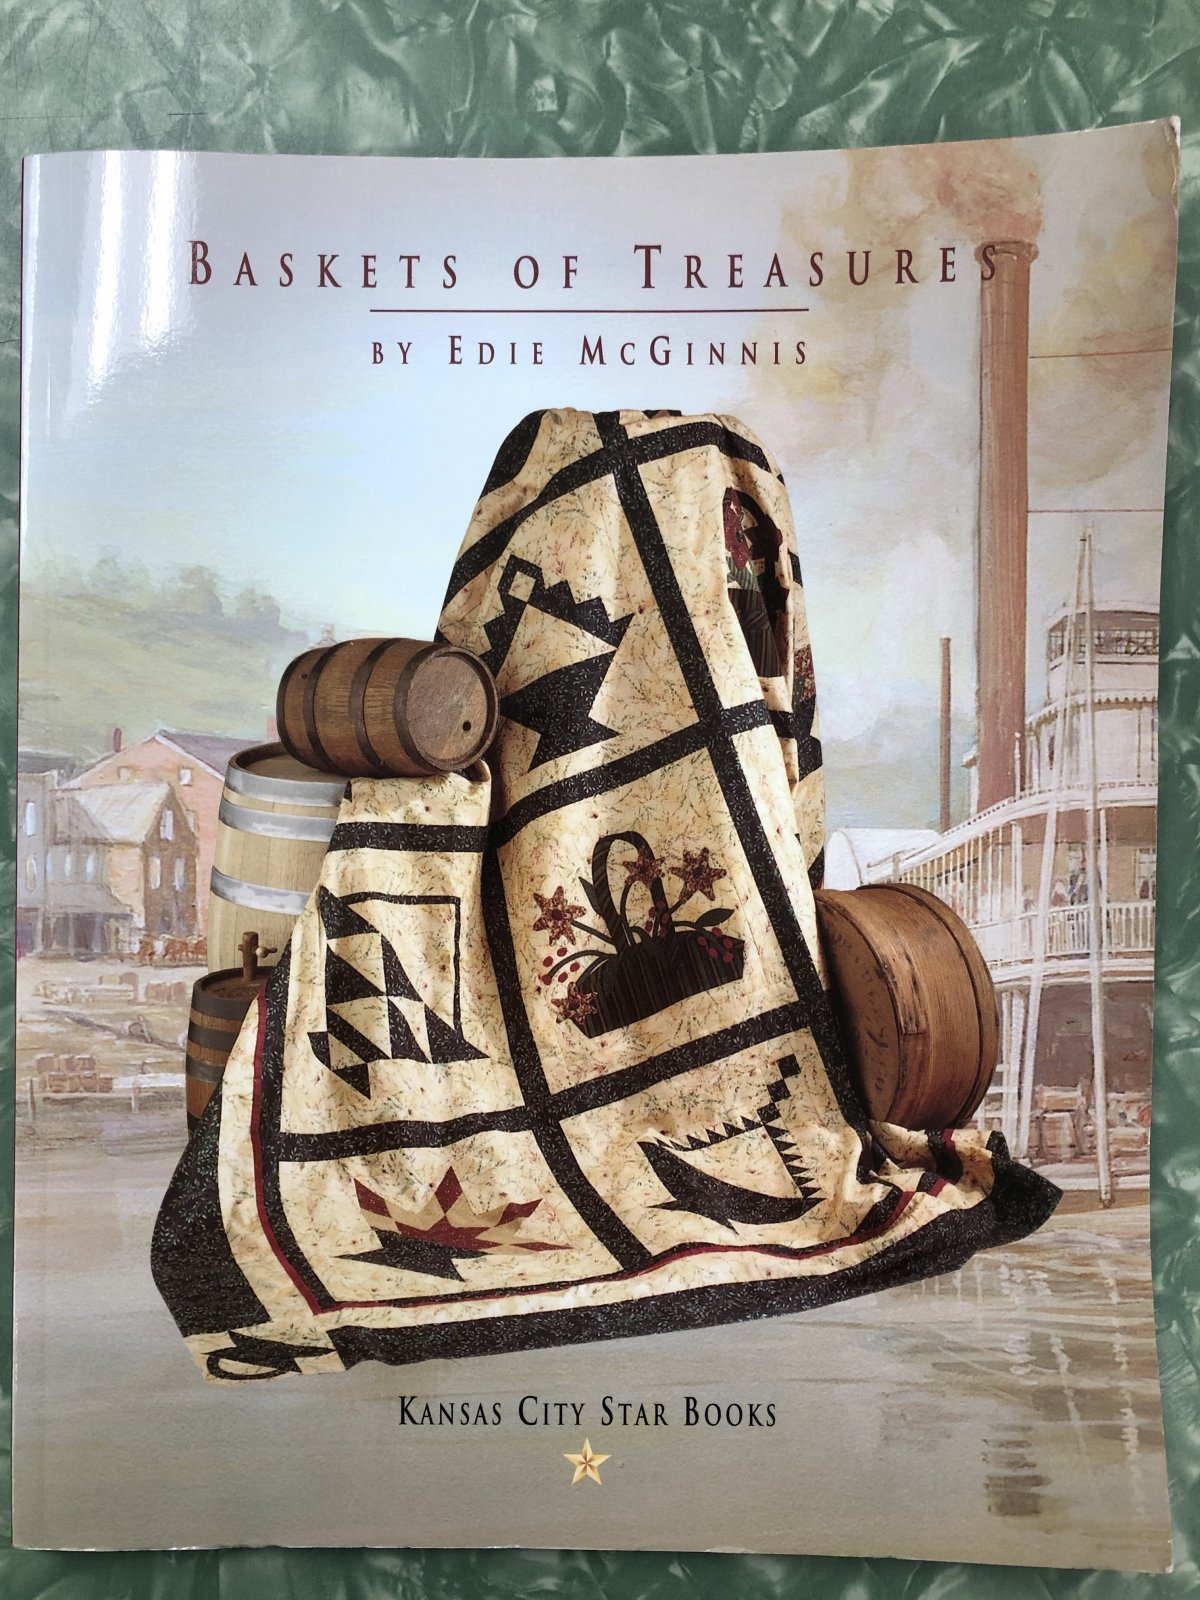 Baskets of Treasures